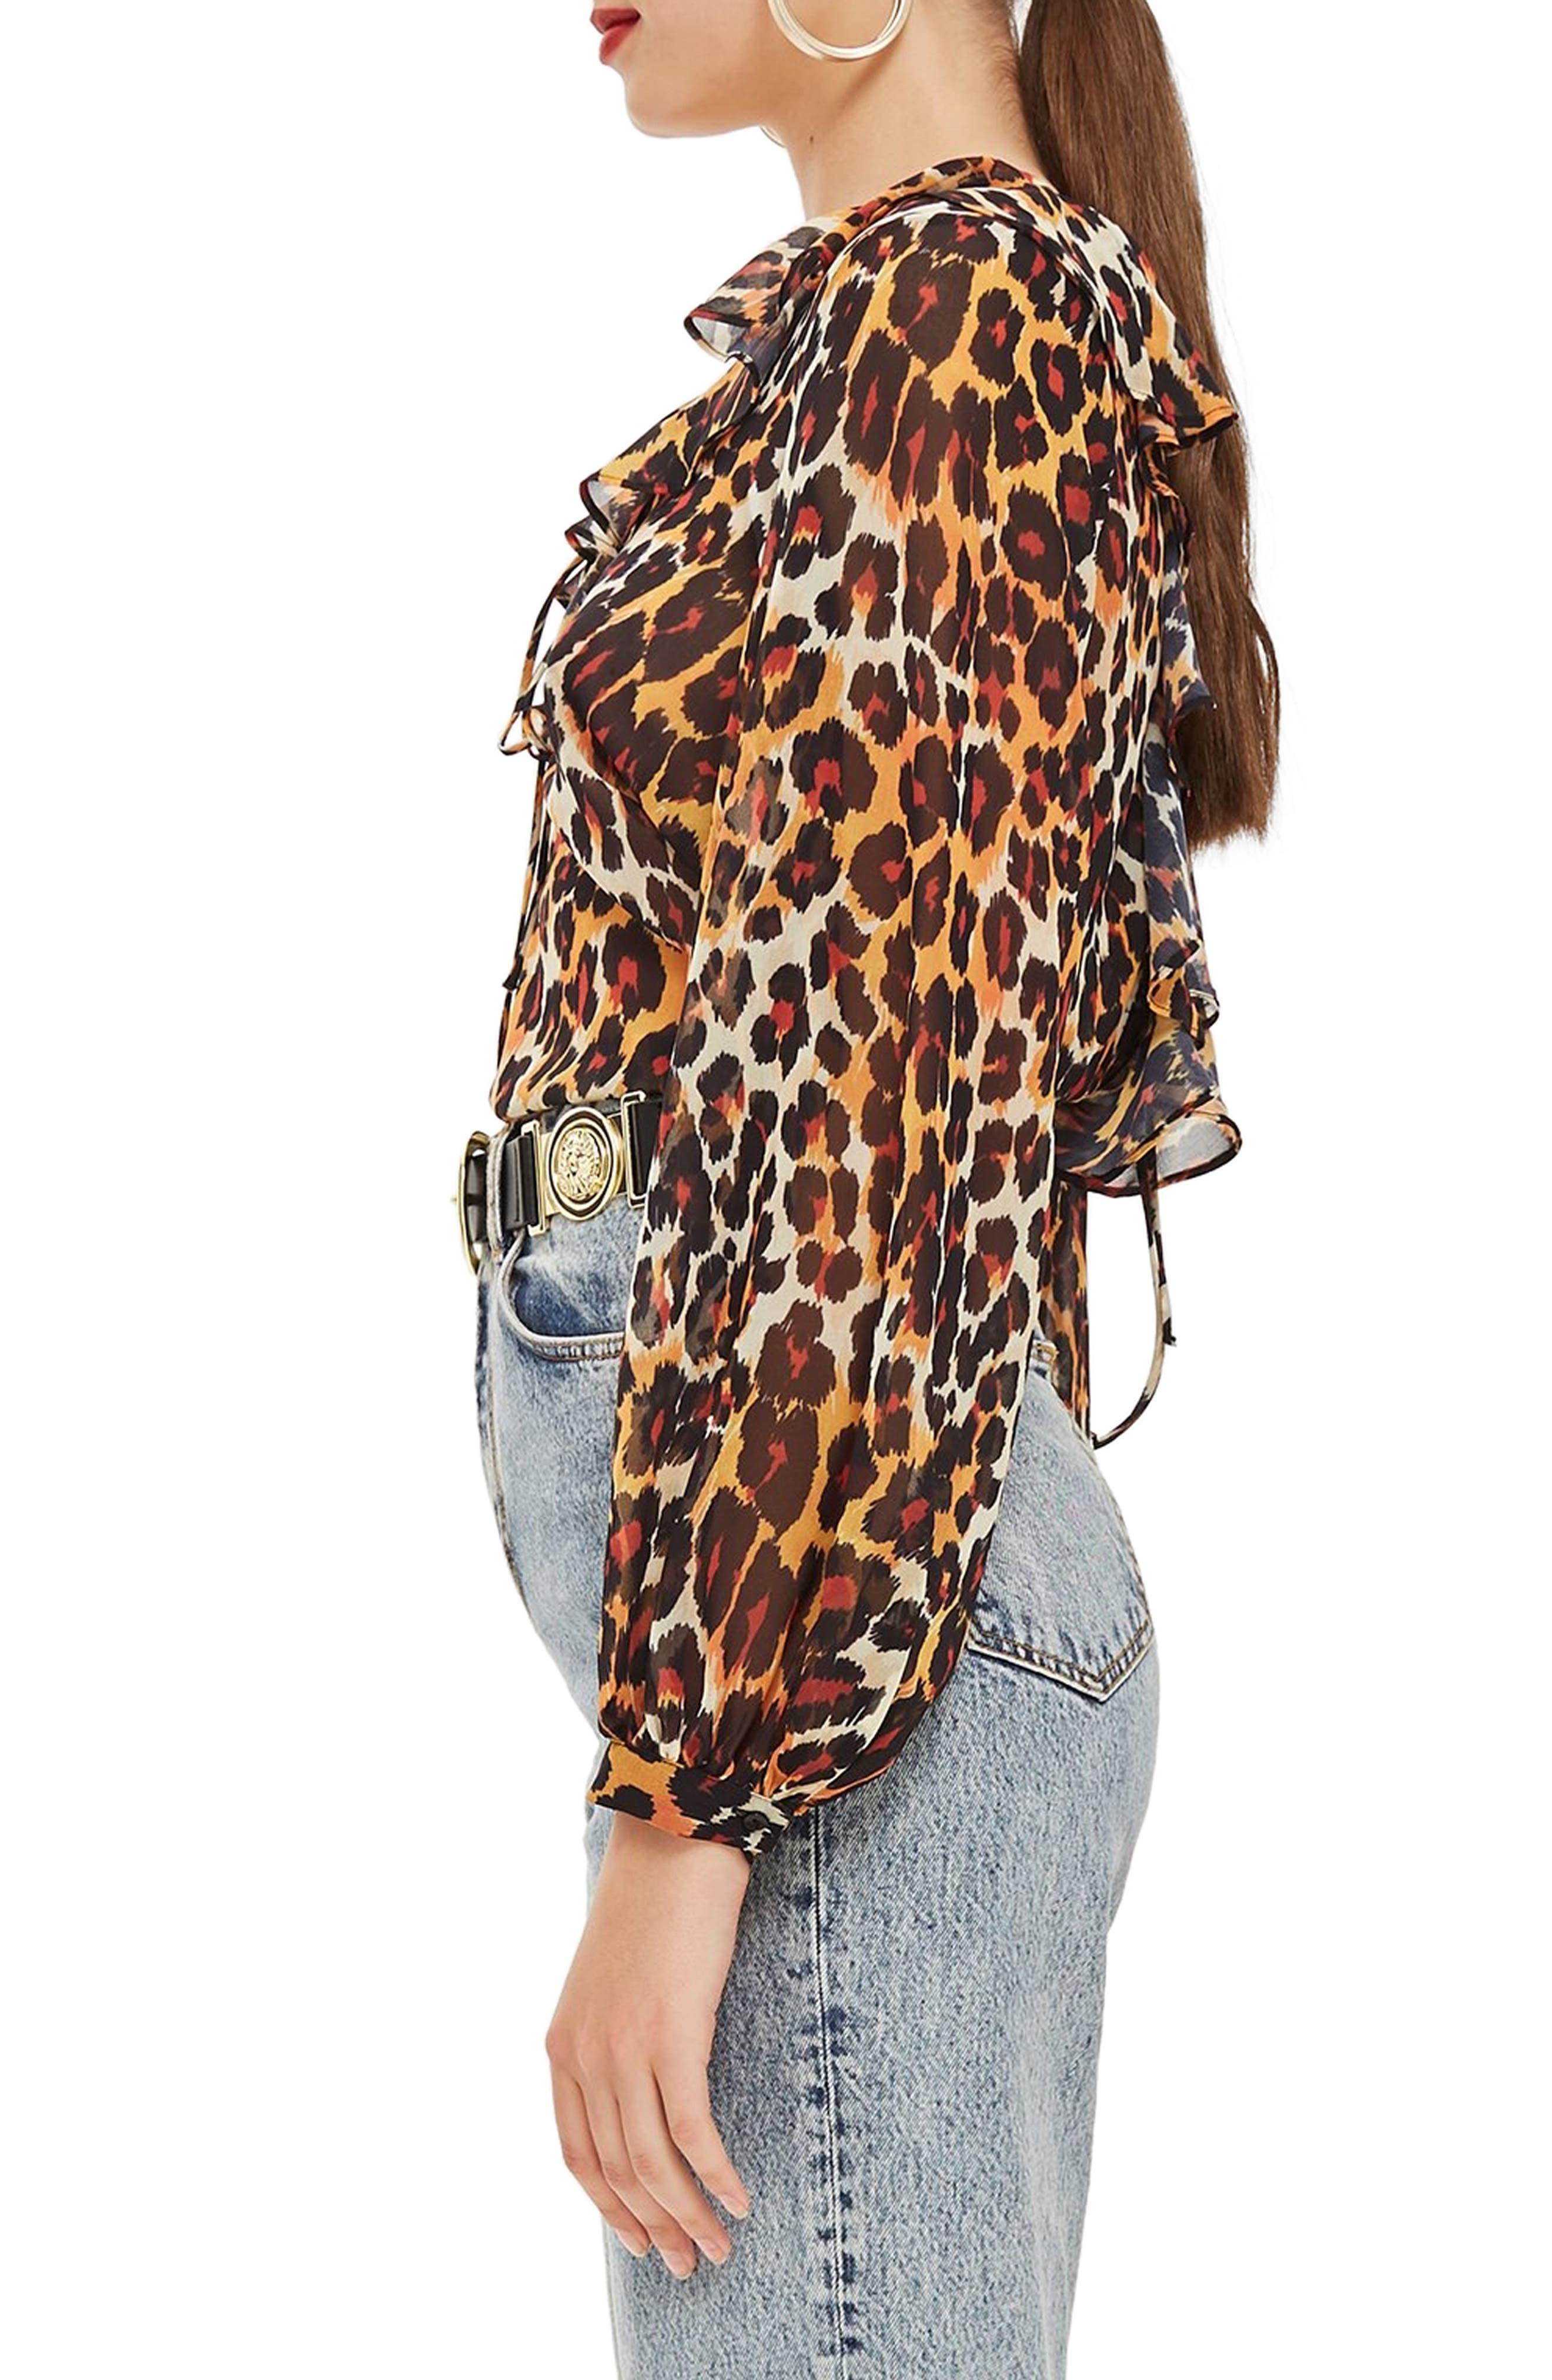 Leopard Print Ruffle Blouse,                             Alternate thumbnail 3, color,                             BROWN MULTI